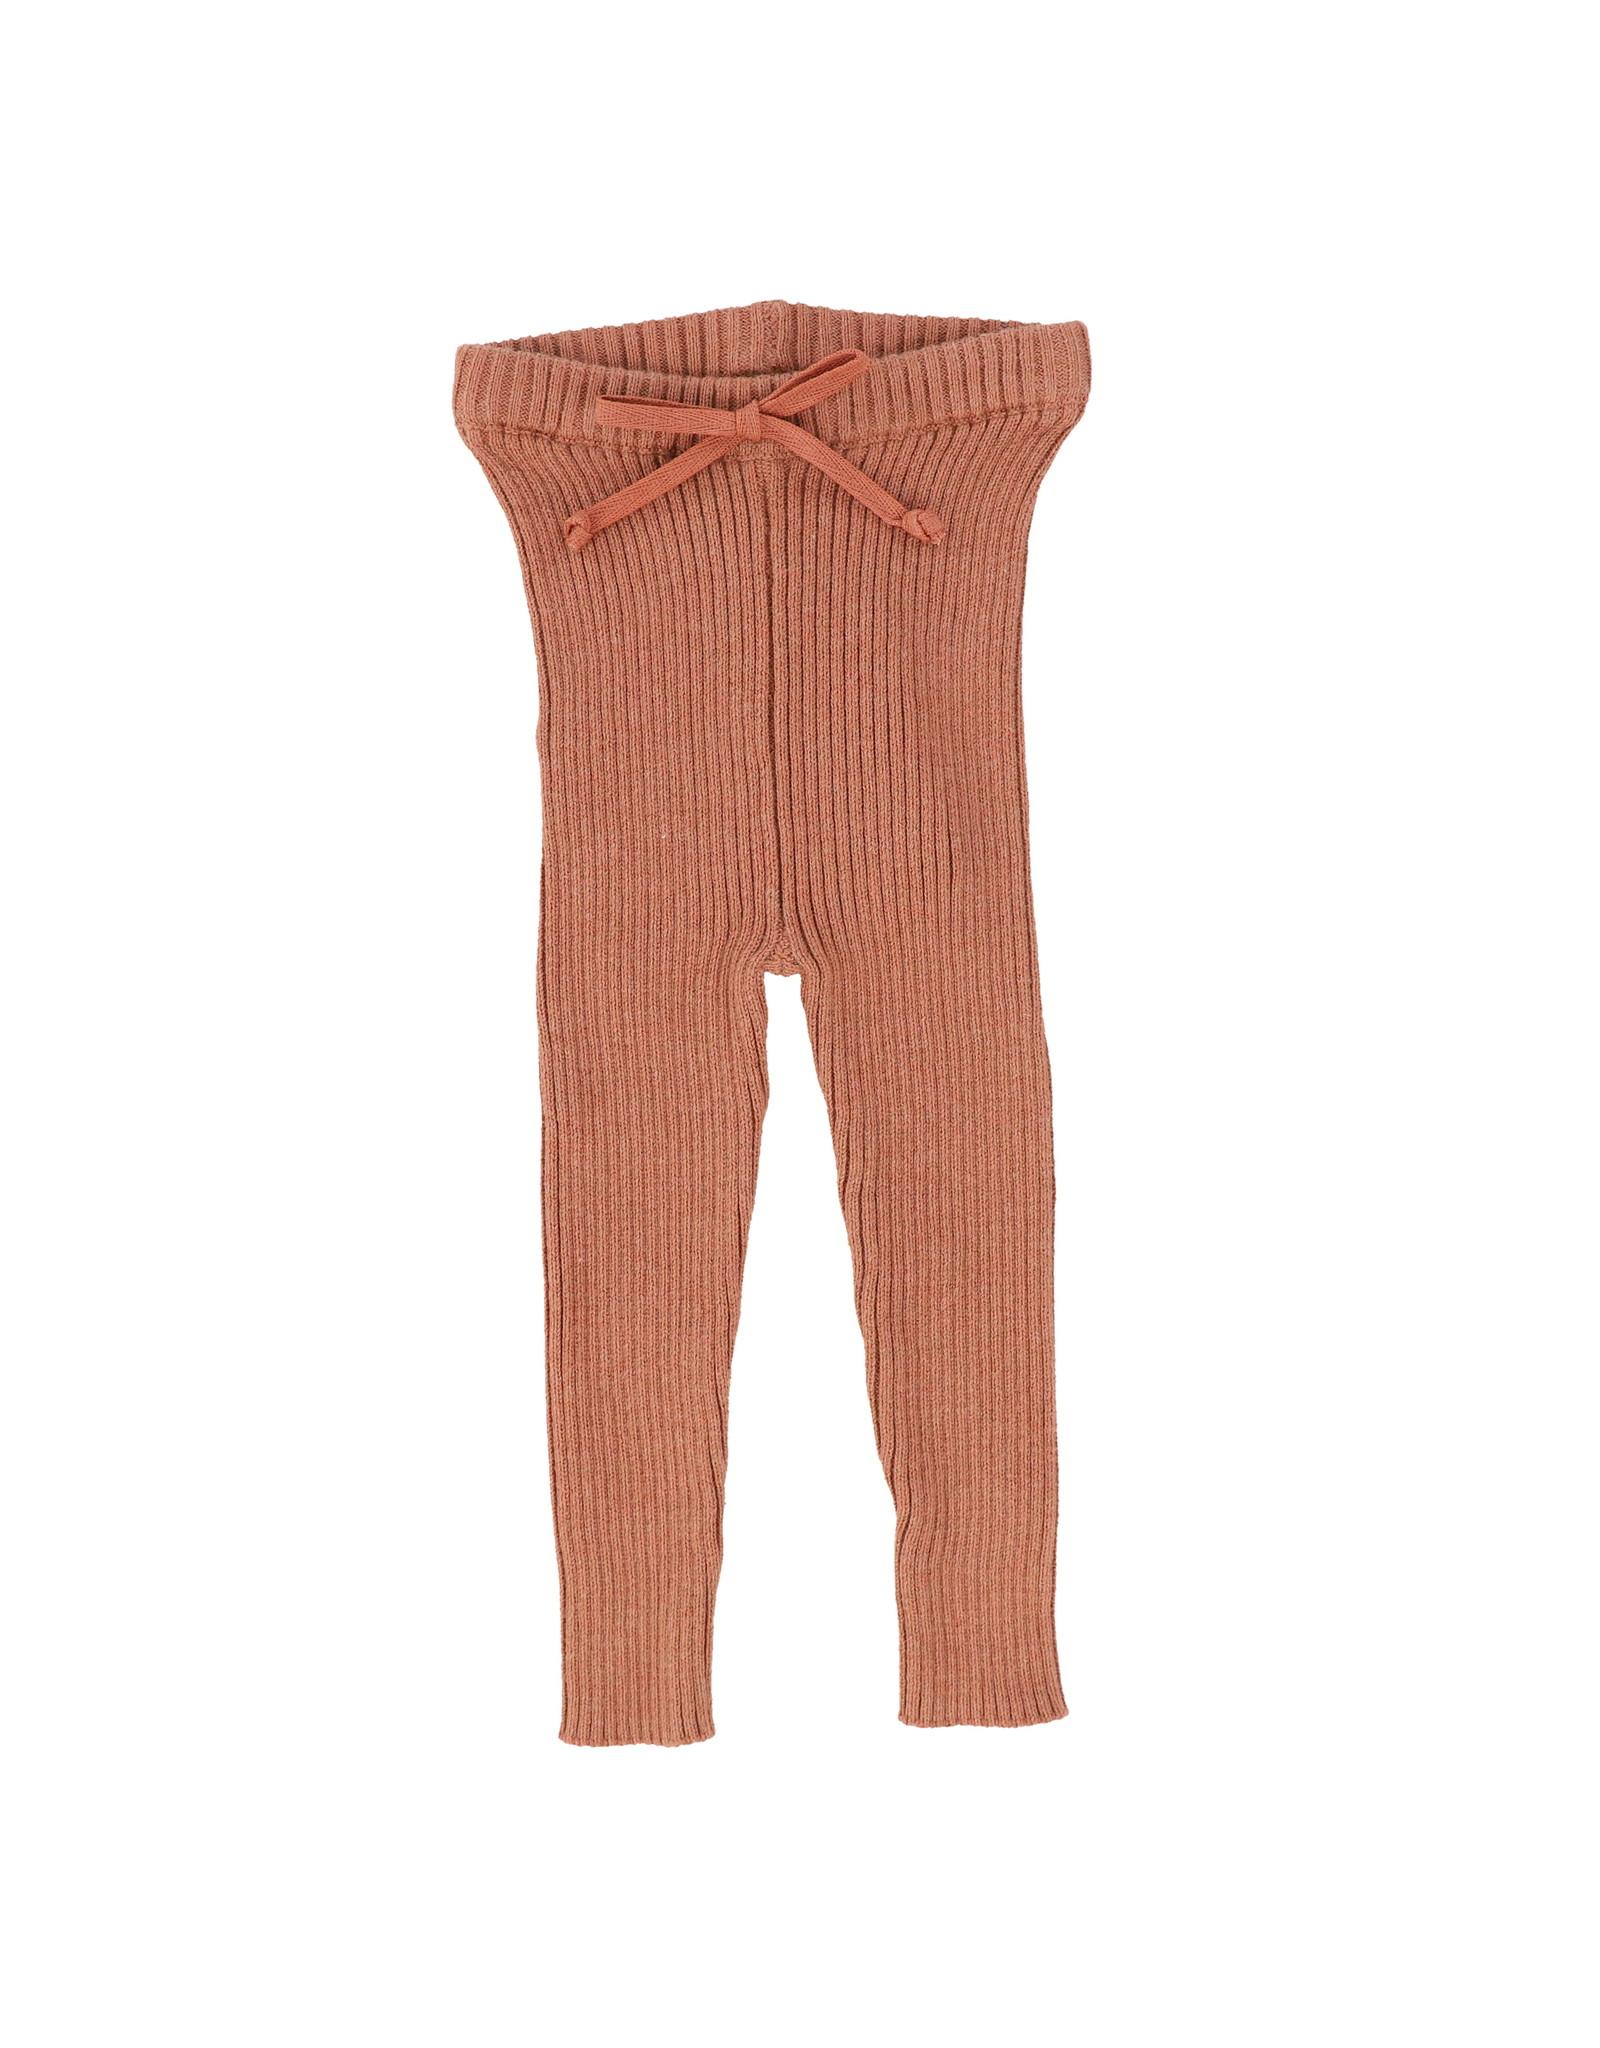 Analogie FW20 Knit Long Leggings